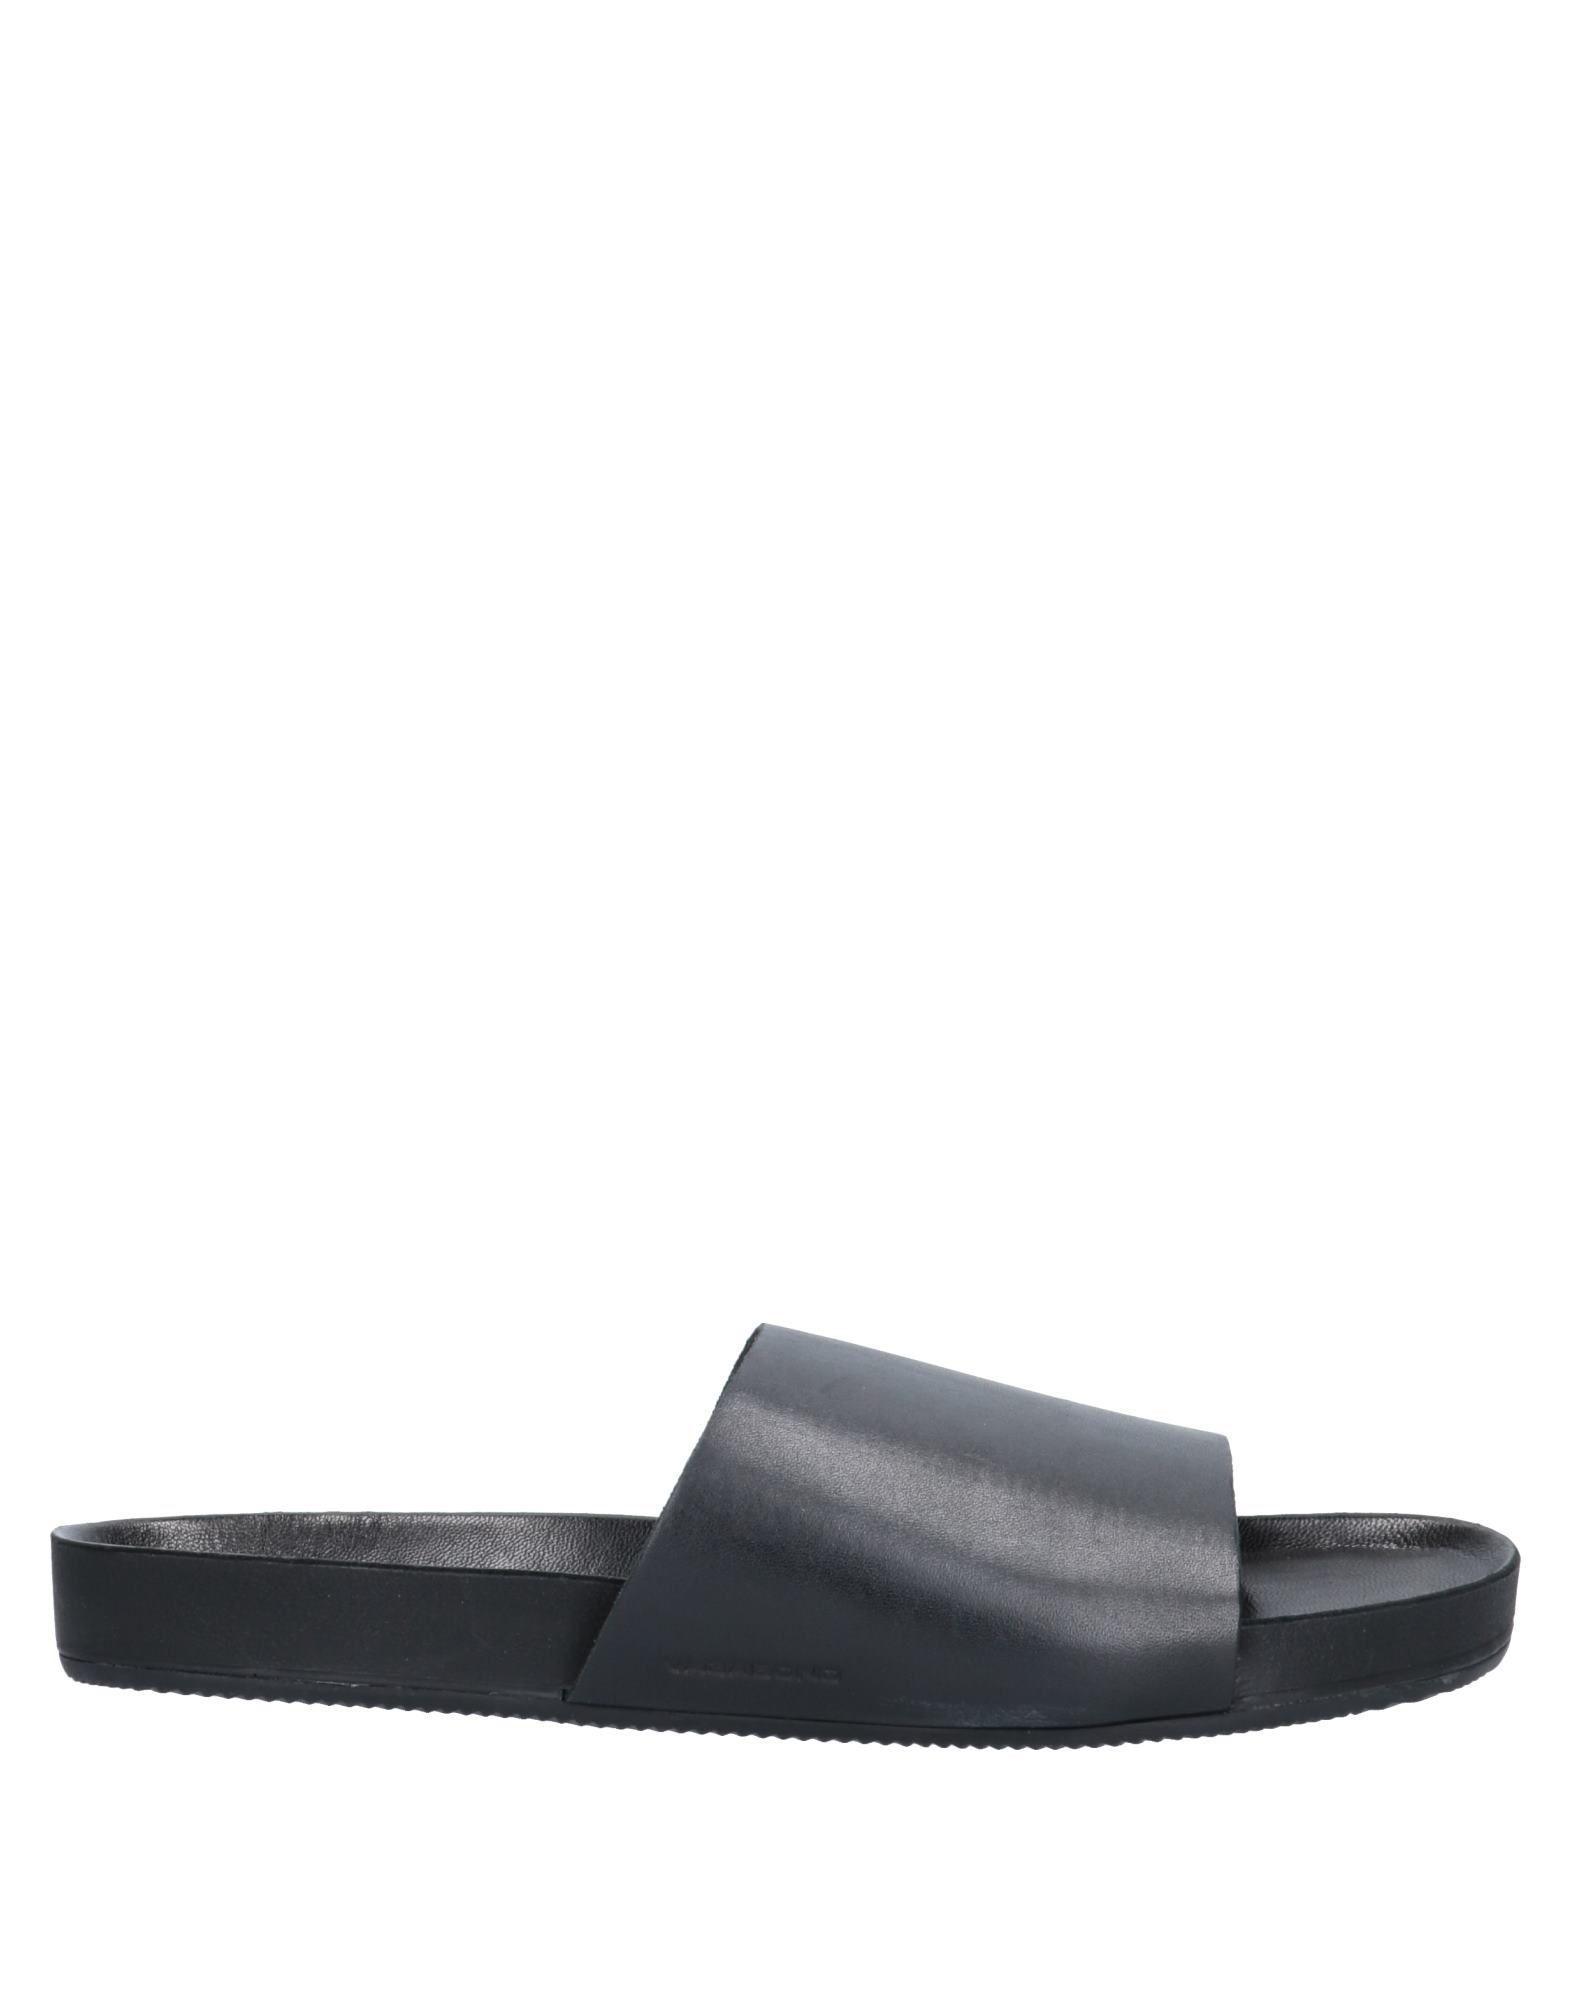 f76c392d08 Lyst - Vagabond Sandals in Black for Men